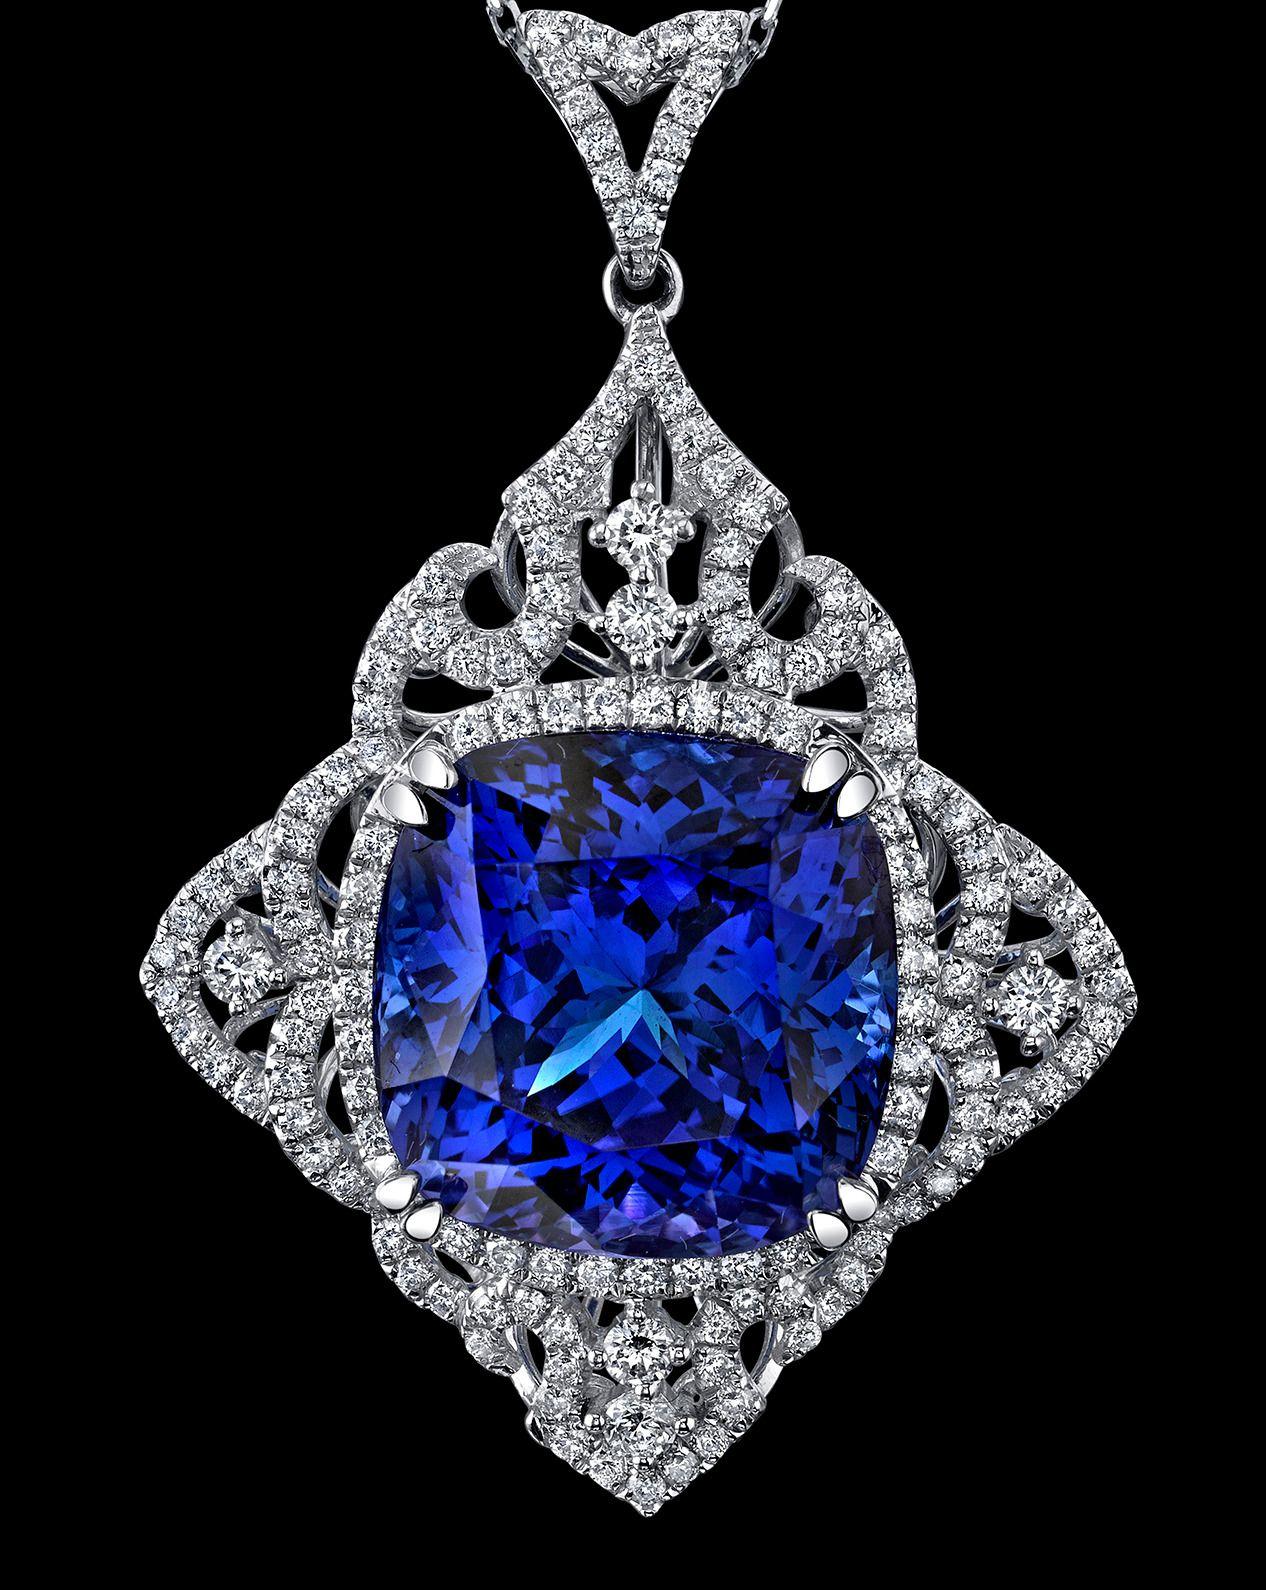 Sensational 2951 carat cushion cut tanzanite diamond gold pendant sensational 2951 carat cushion cut tanzanite diamond gold pendant necklace mozeypictures Images